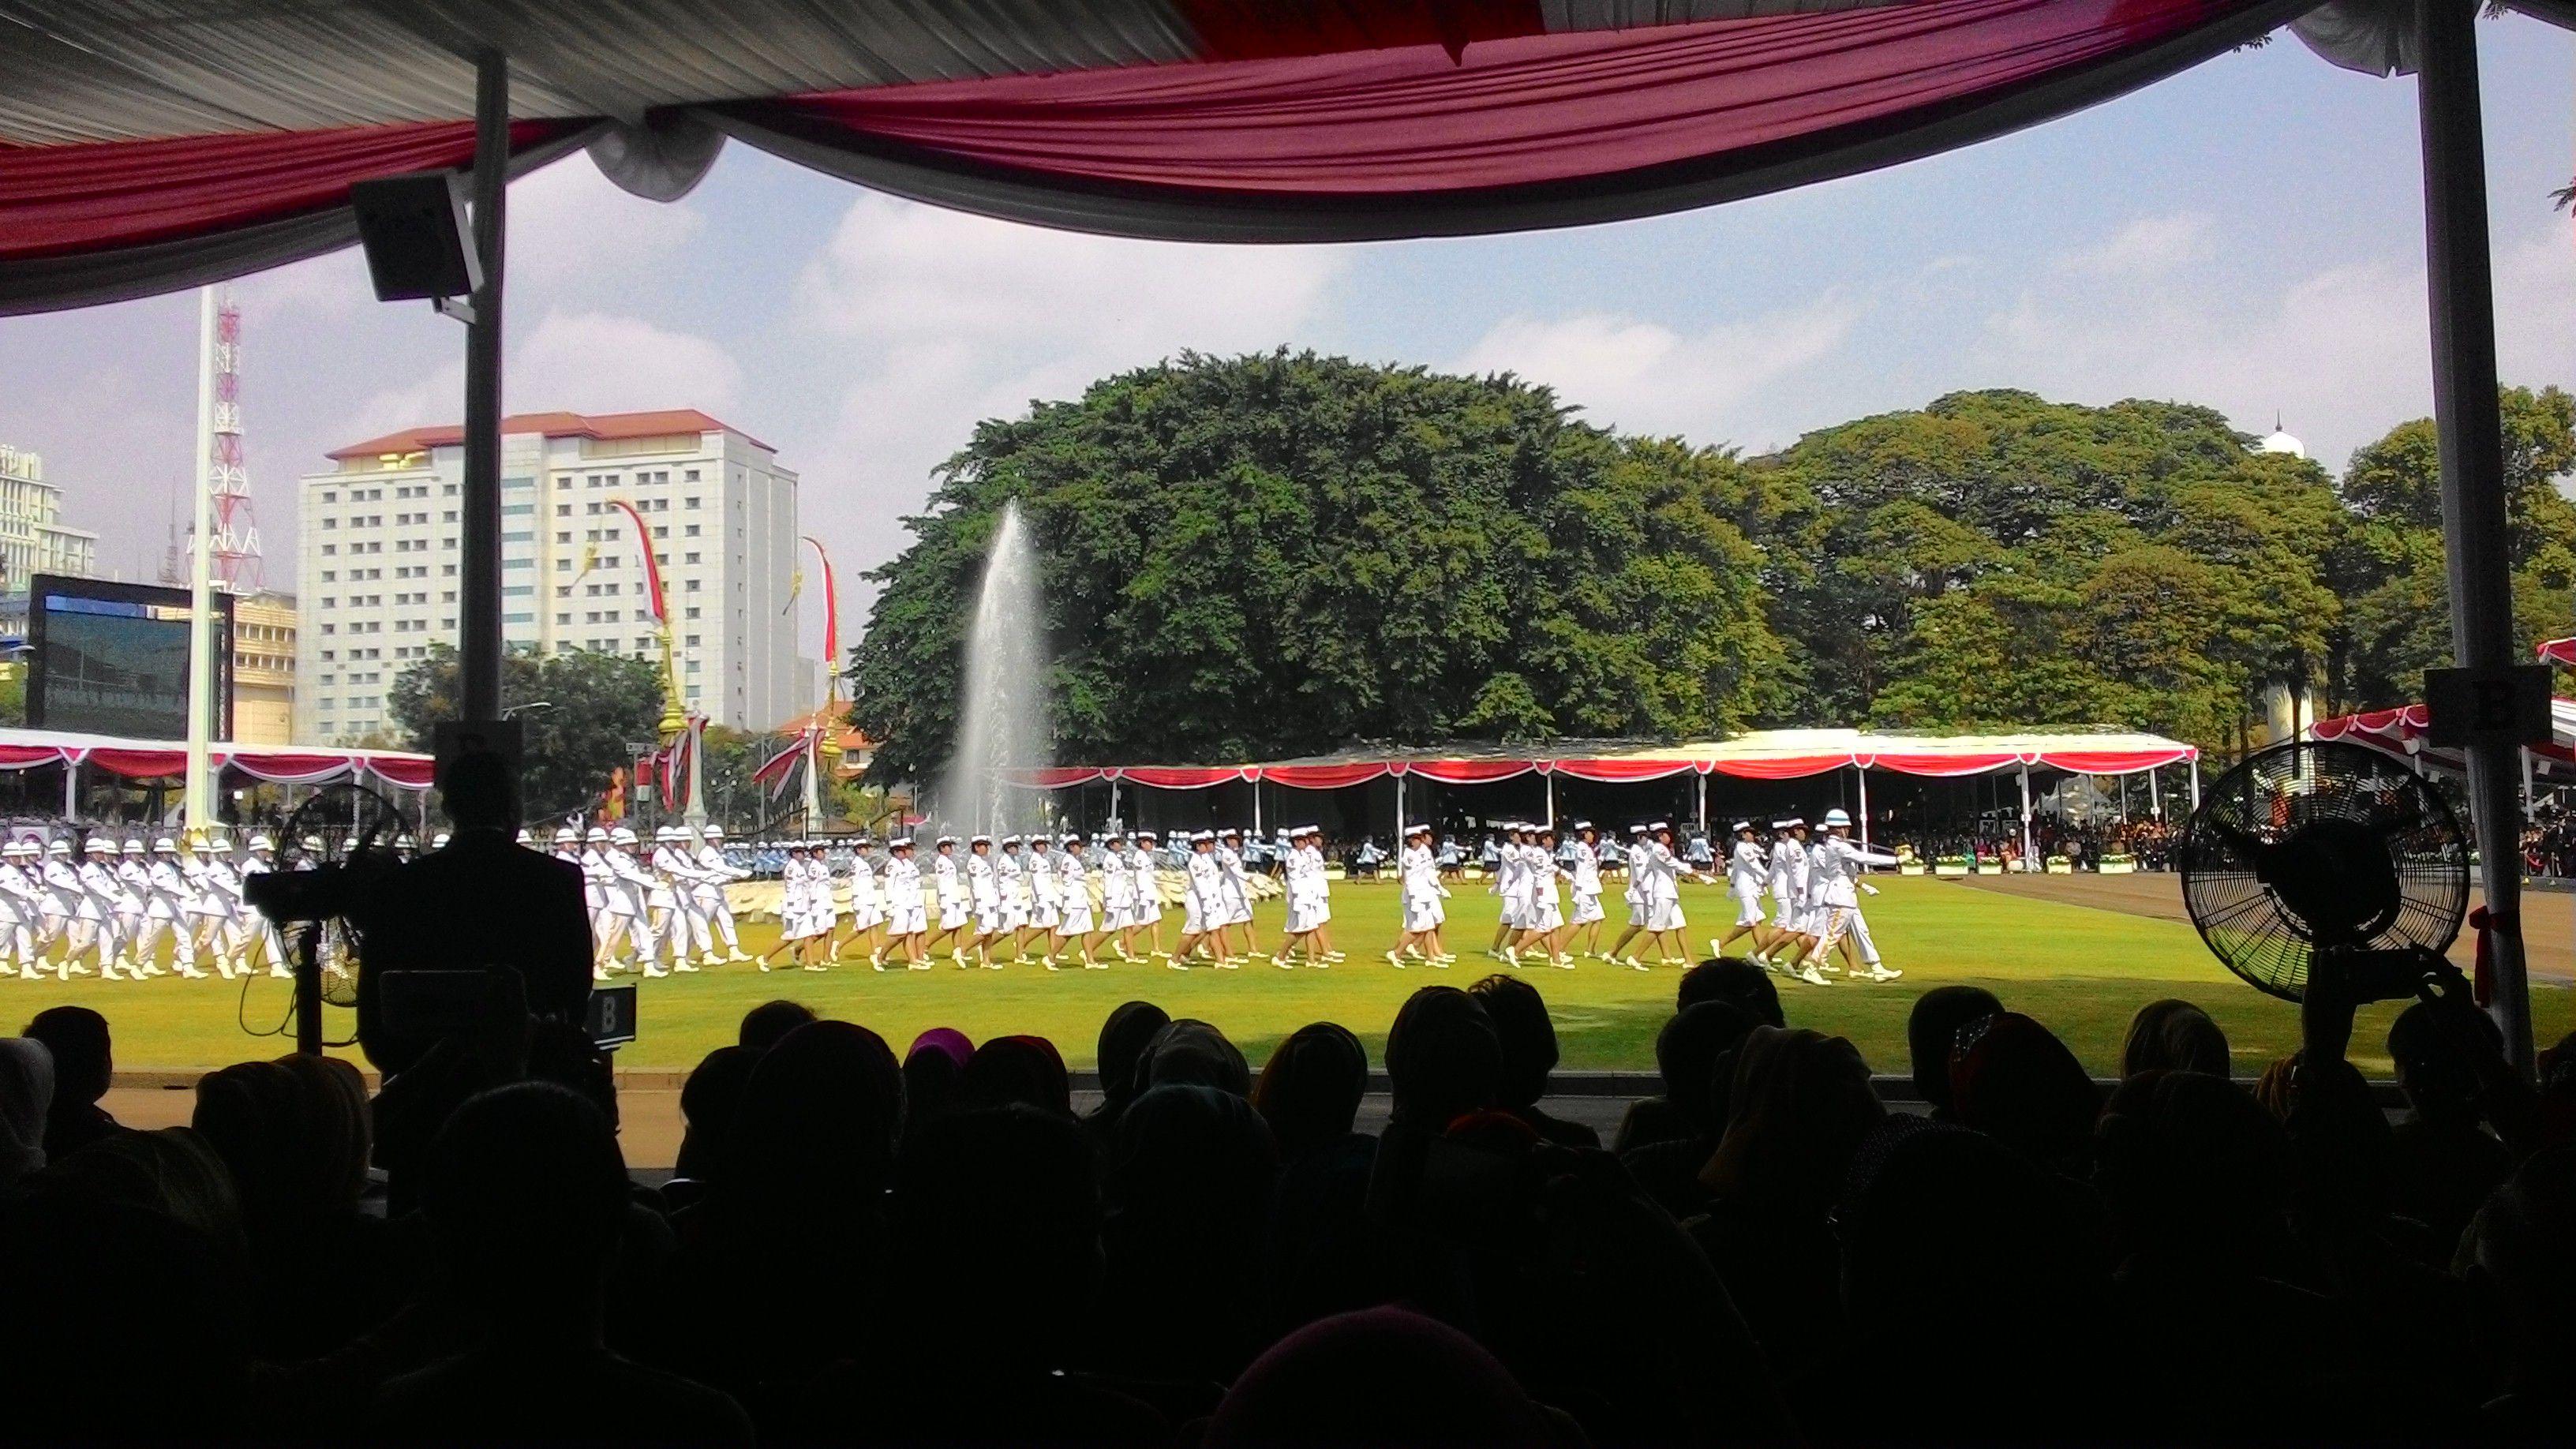 70 Tahun Telah Merdeka Ini Mimpi Anak Anak Indonesia Pembacaan puisi Mimpi Anak Indonesia turut mewarnai upacara peringatan detik detik proklamasi di